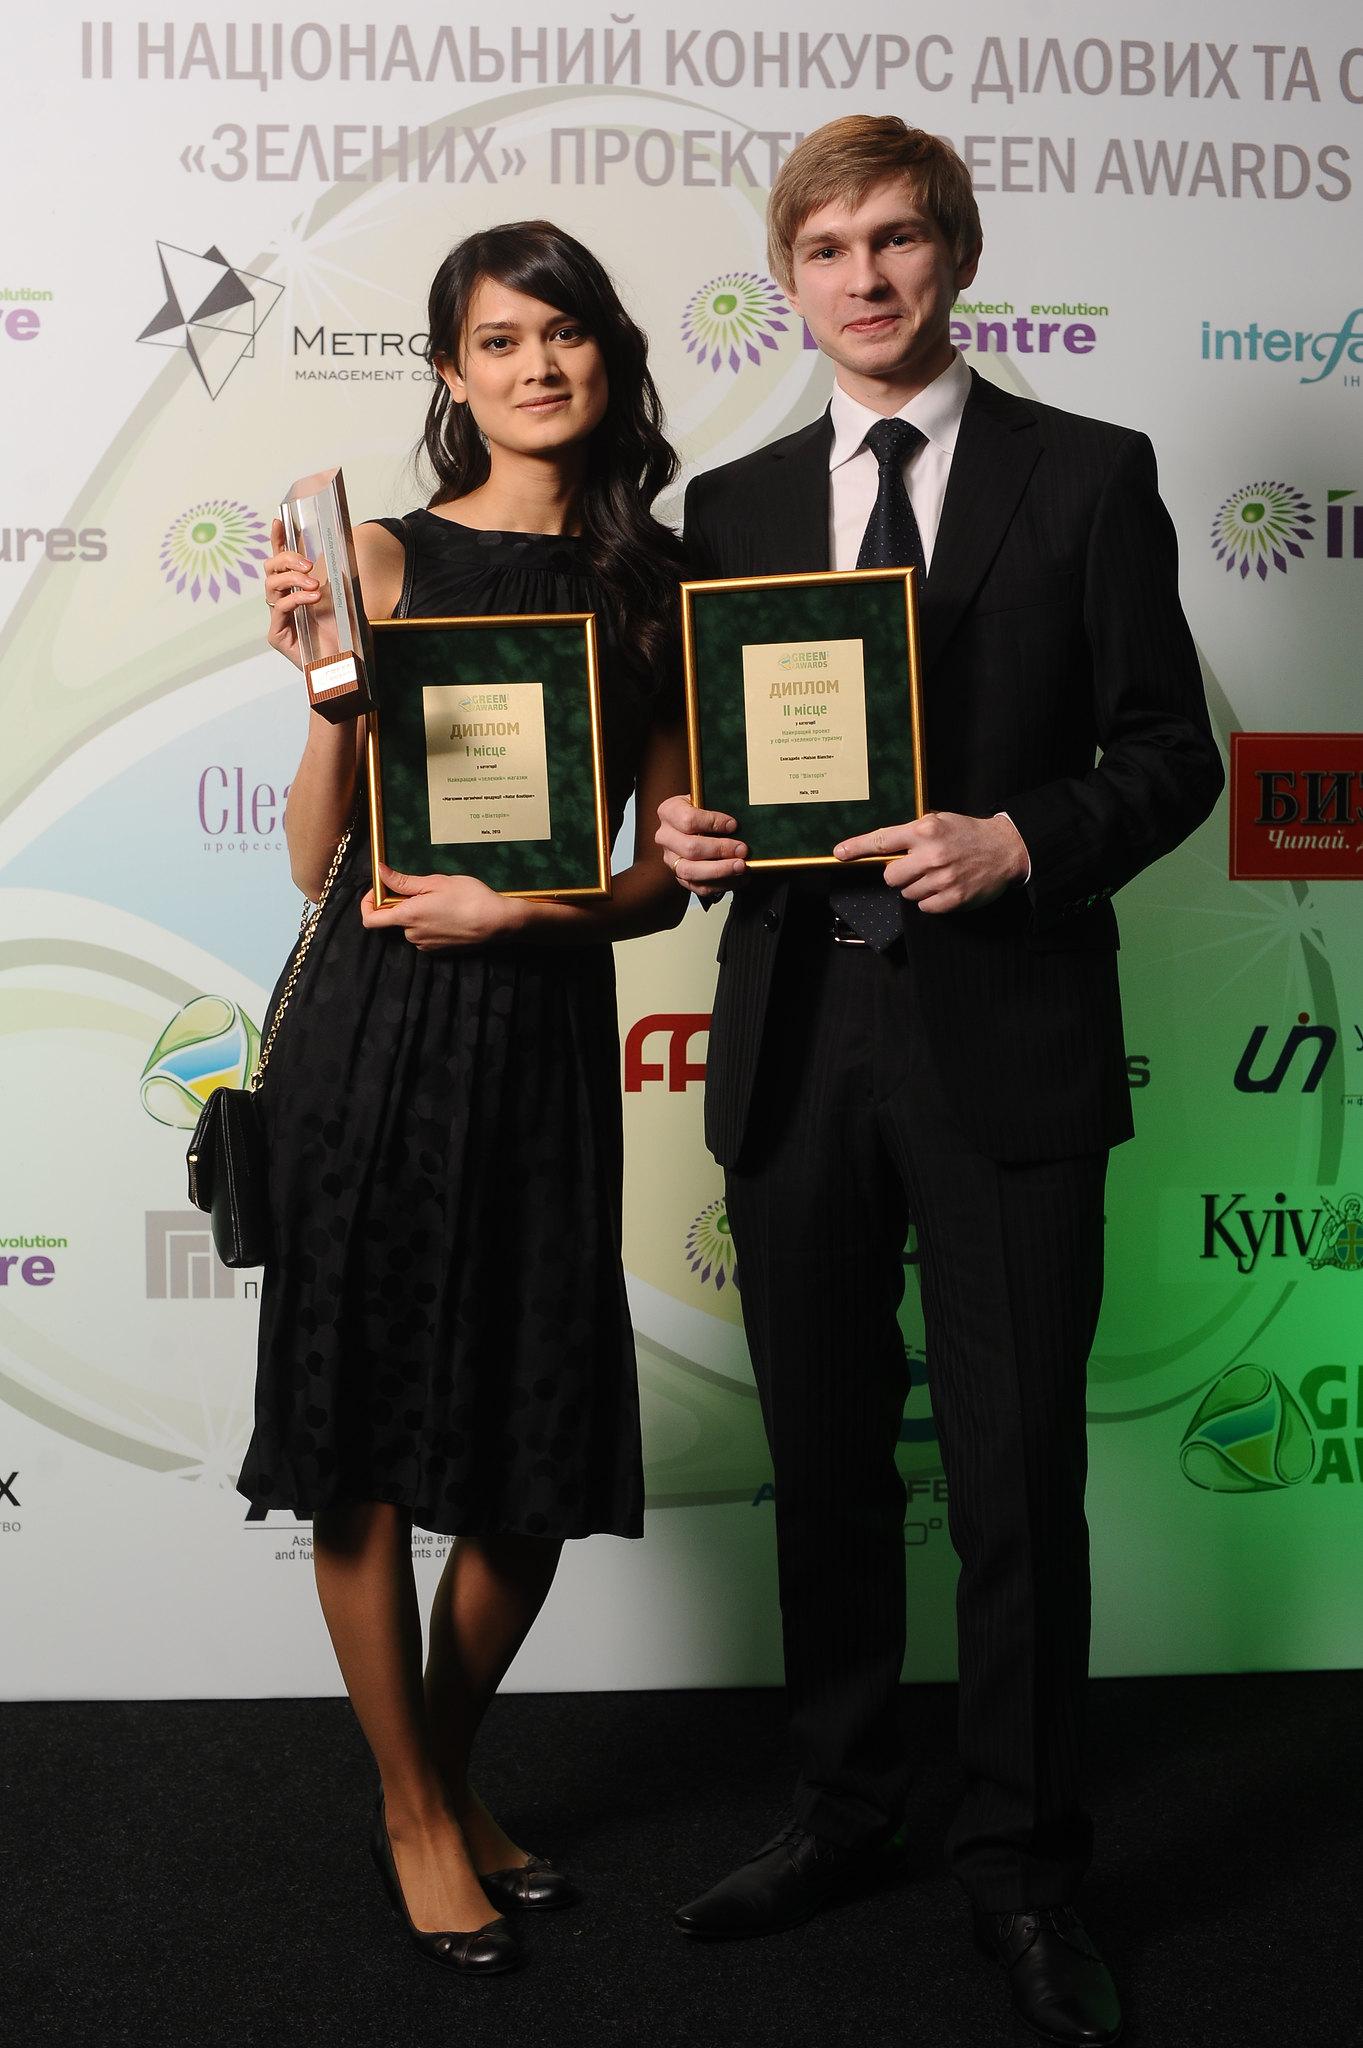 Green Awards Ukraine